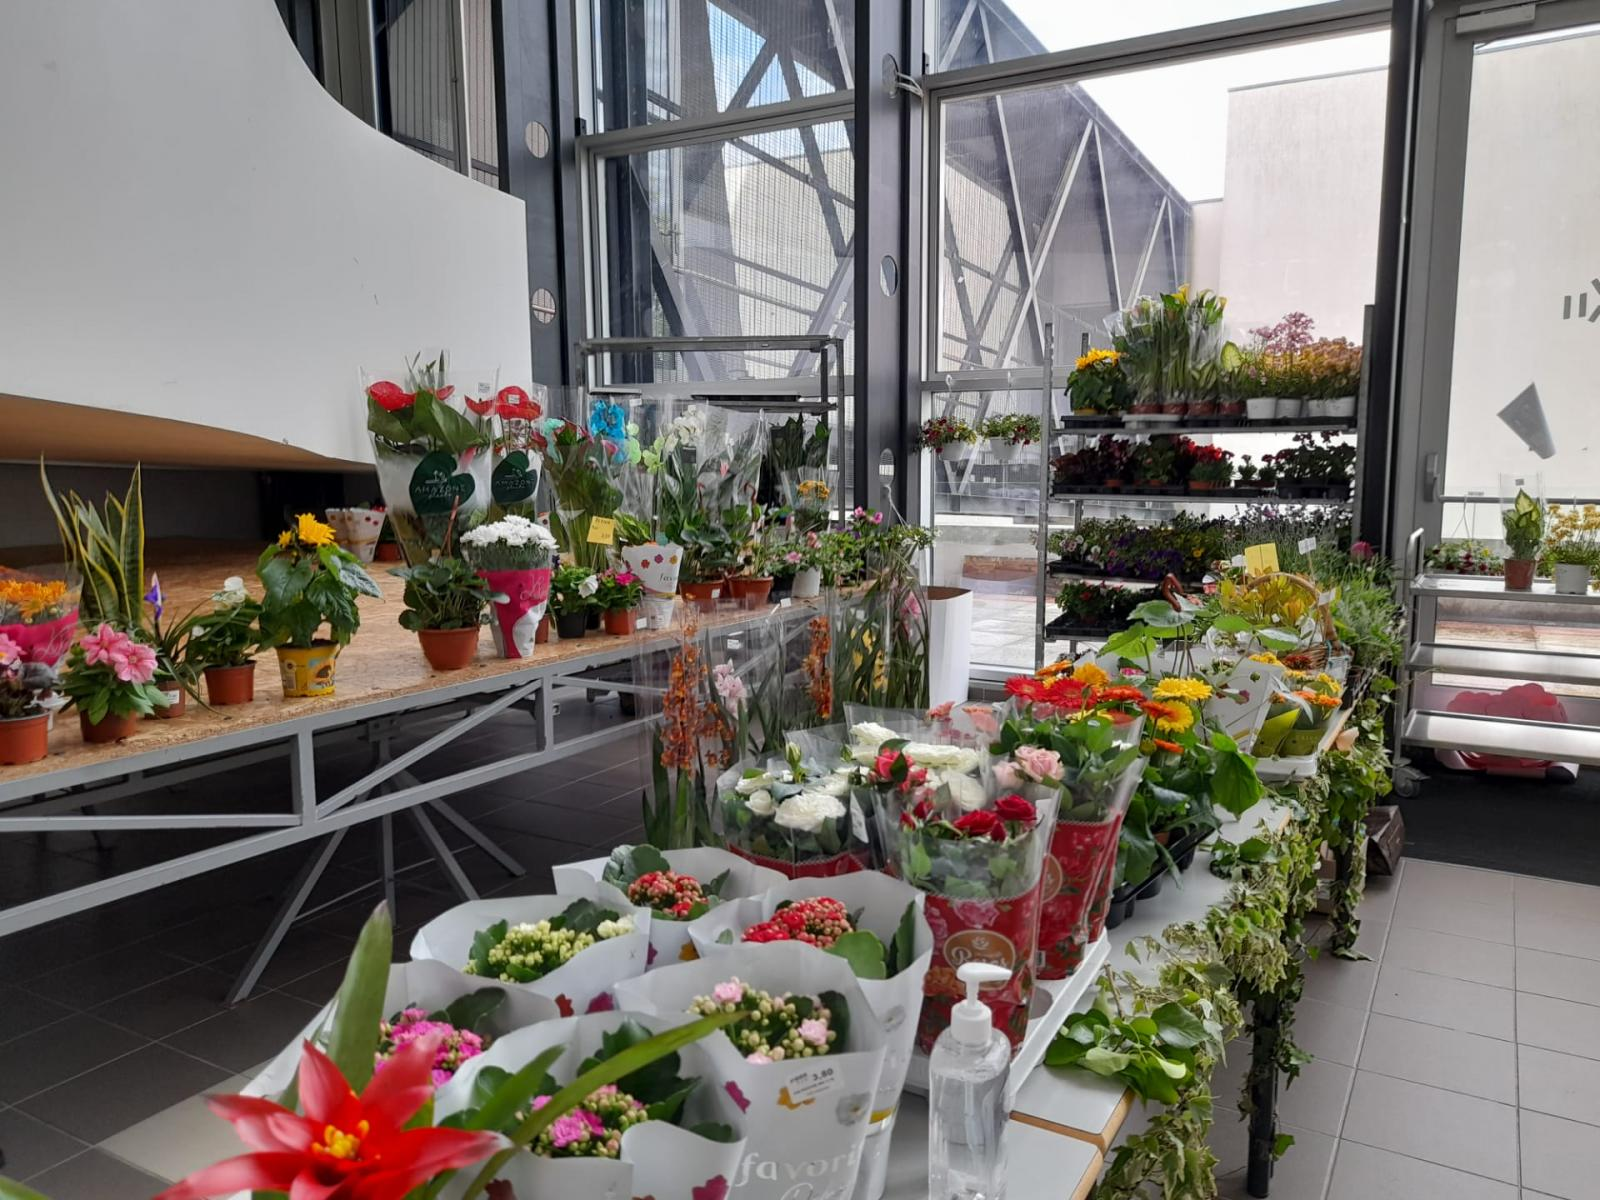 Feira das plantas